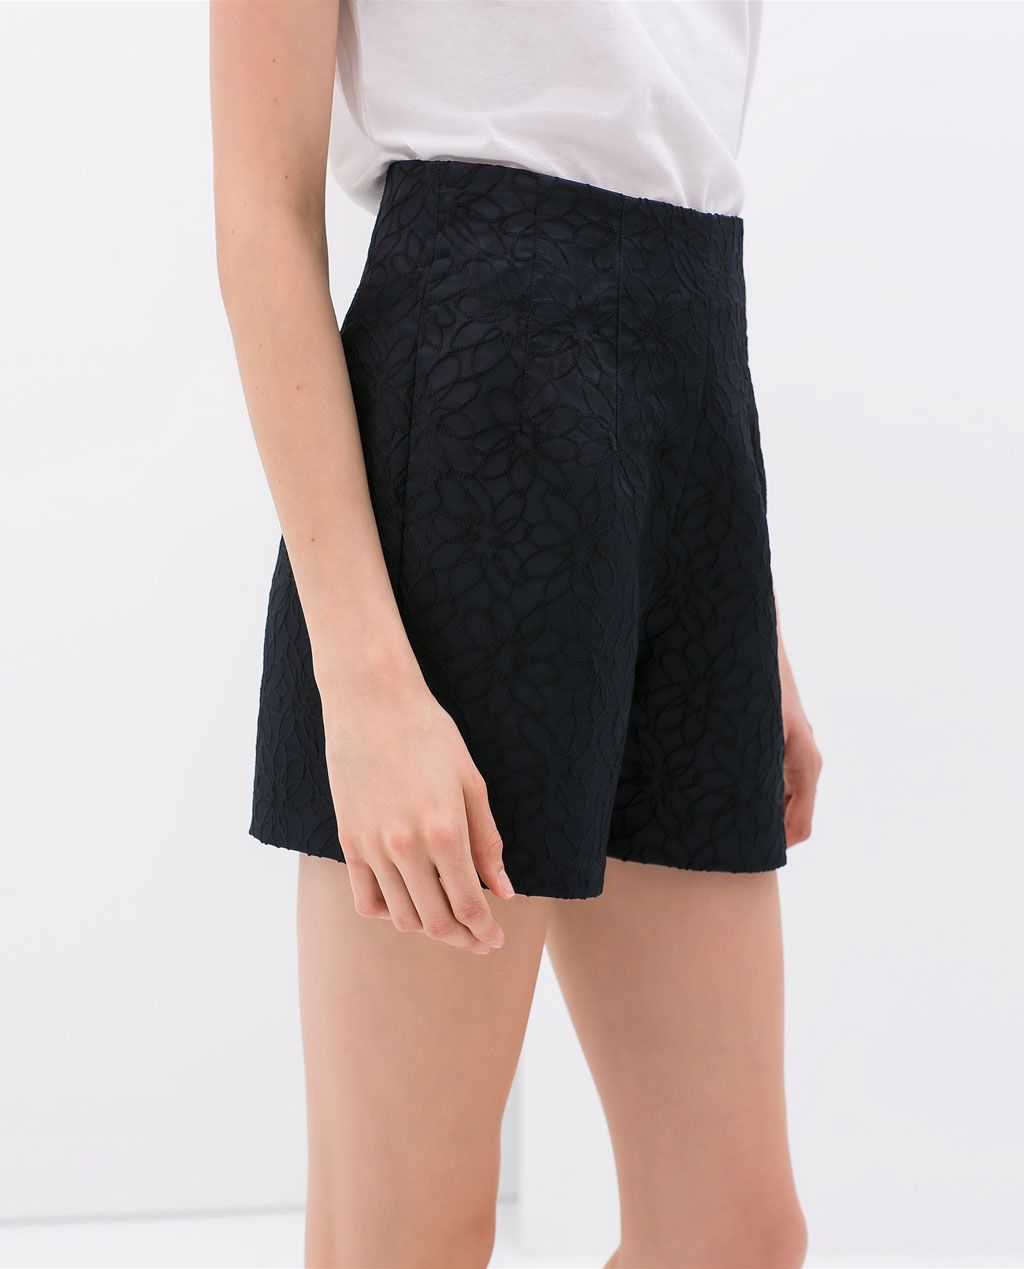 Daisy Denim Shorts - Cute High Waisted Shorts - $36